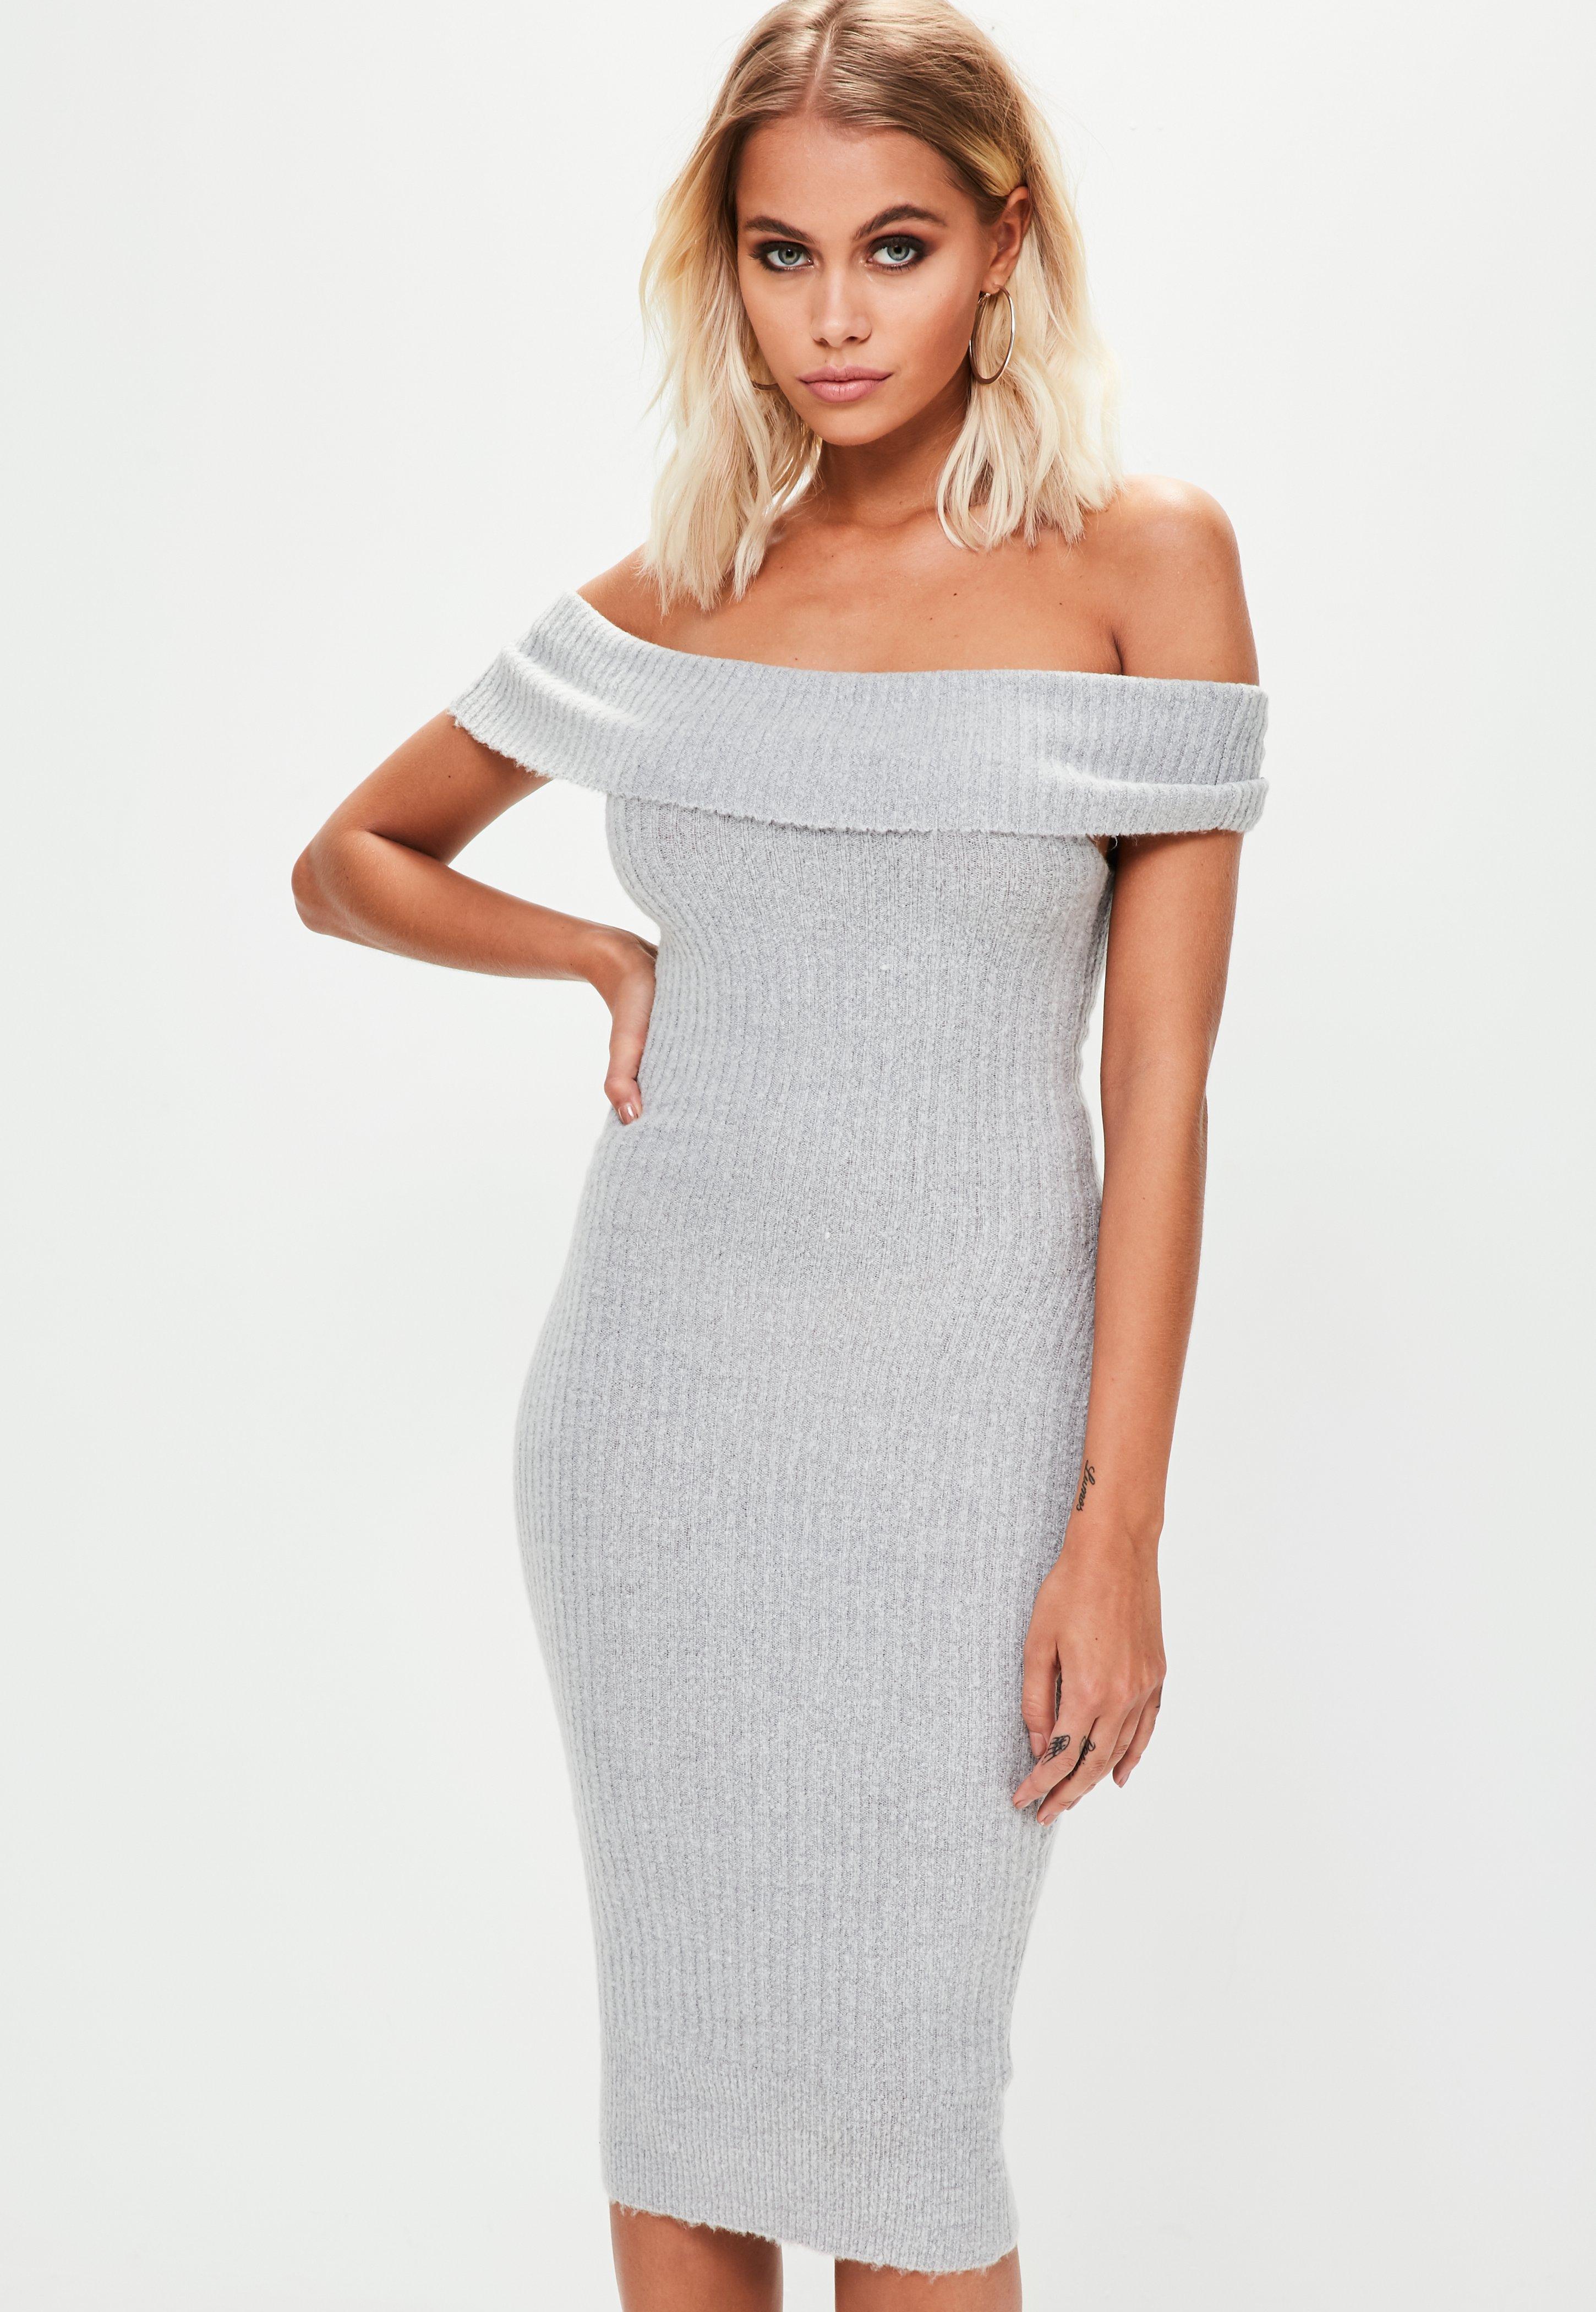 Grey Bardot Bodycon Knitted Dress Grey Bardot Bodycon Knitted Dress